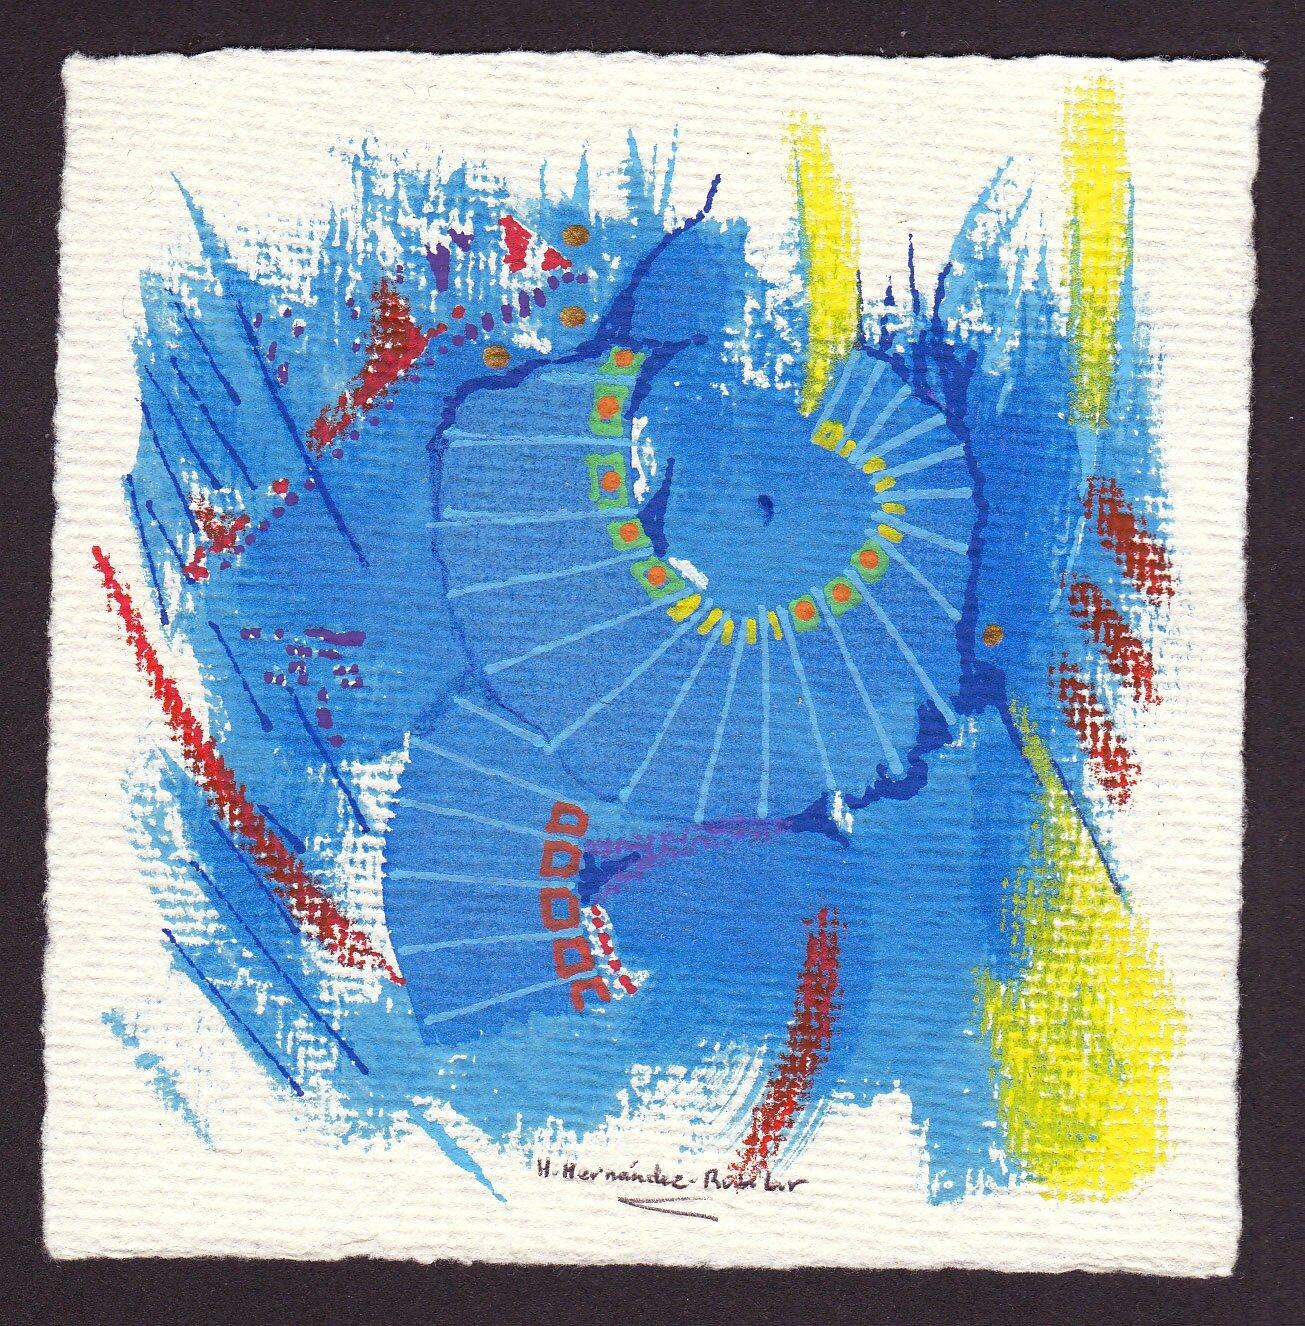 "Art Abstrait - Hector Hernandez-Rubilar ""HH"" - Art Contemporain"